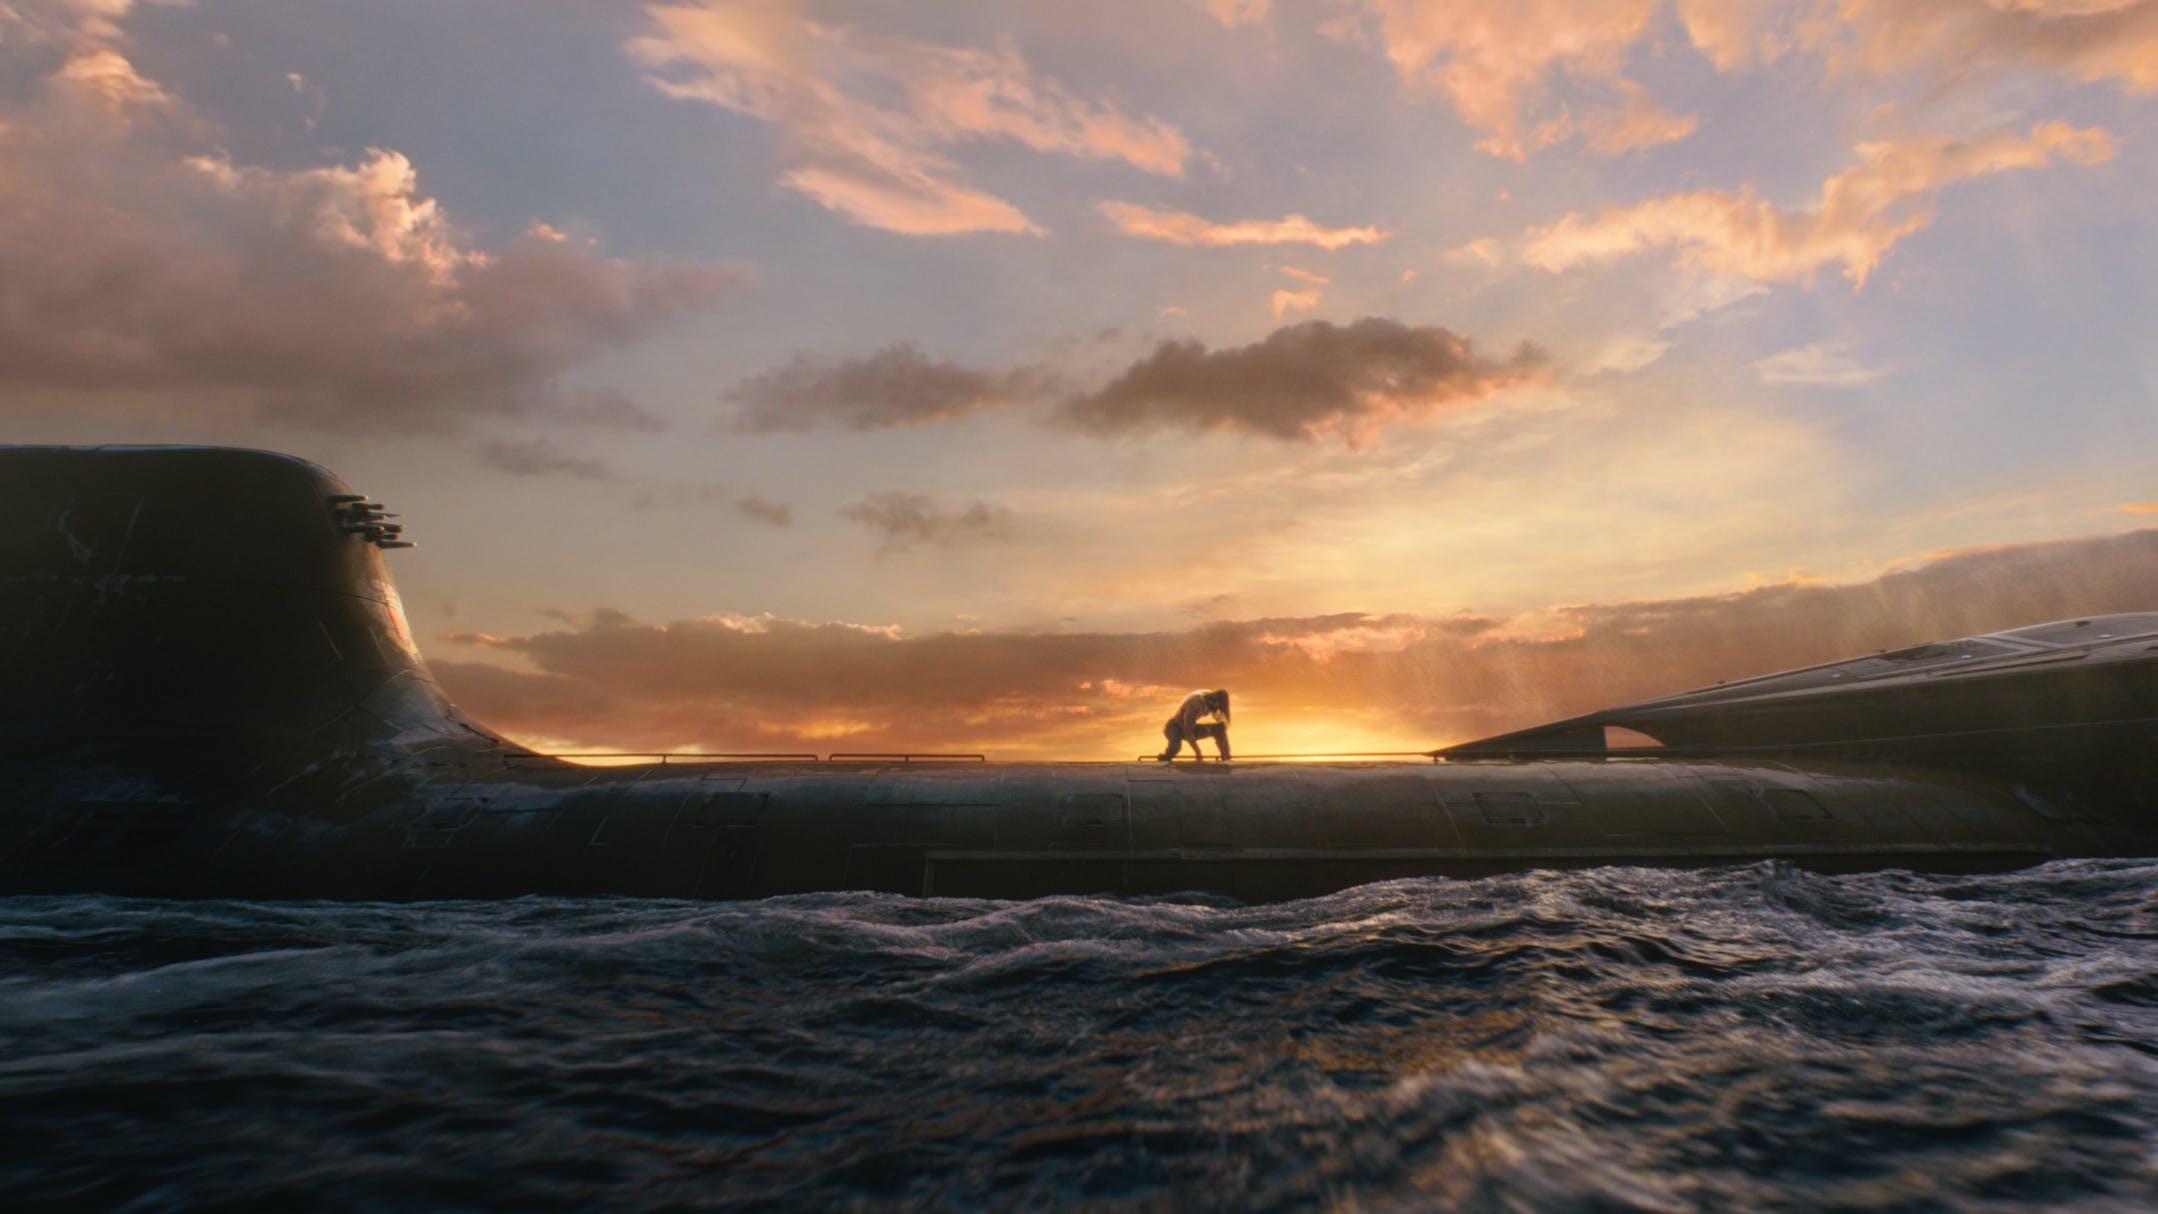 Scanline VFX. Aquaman. Cloud Rendering. Render Farm.